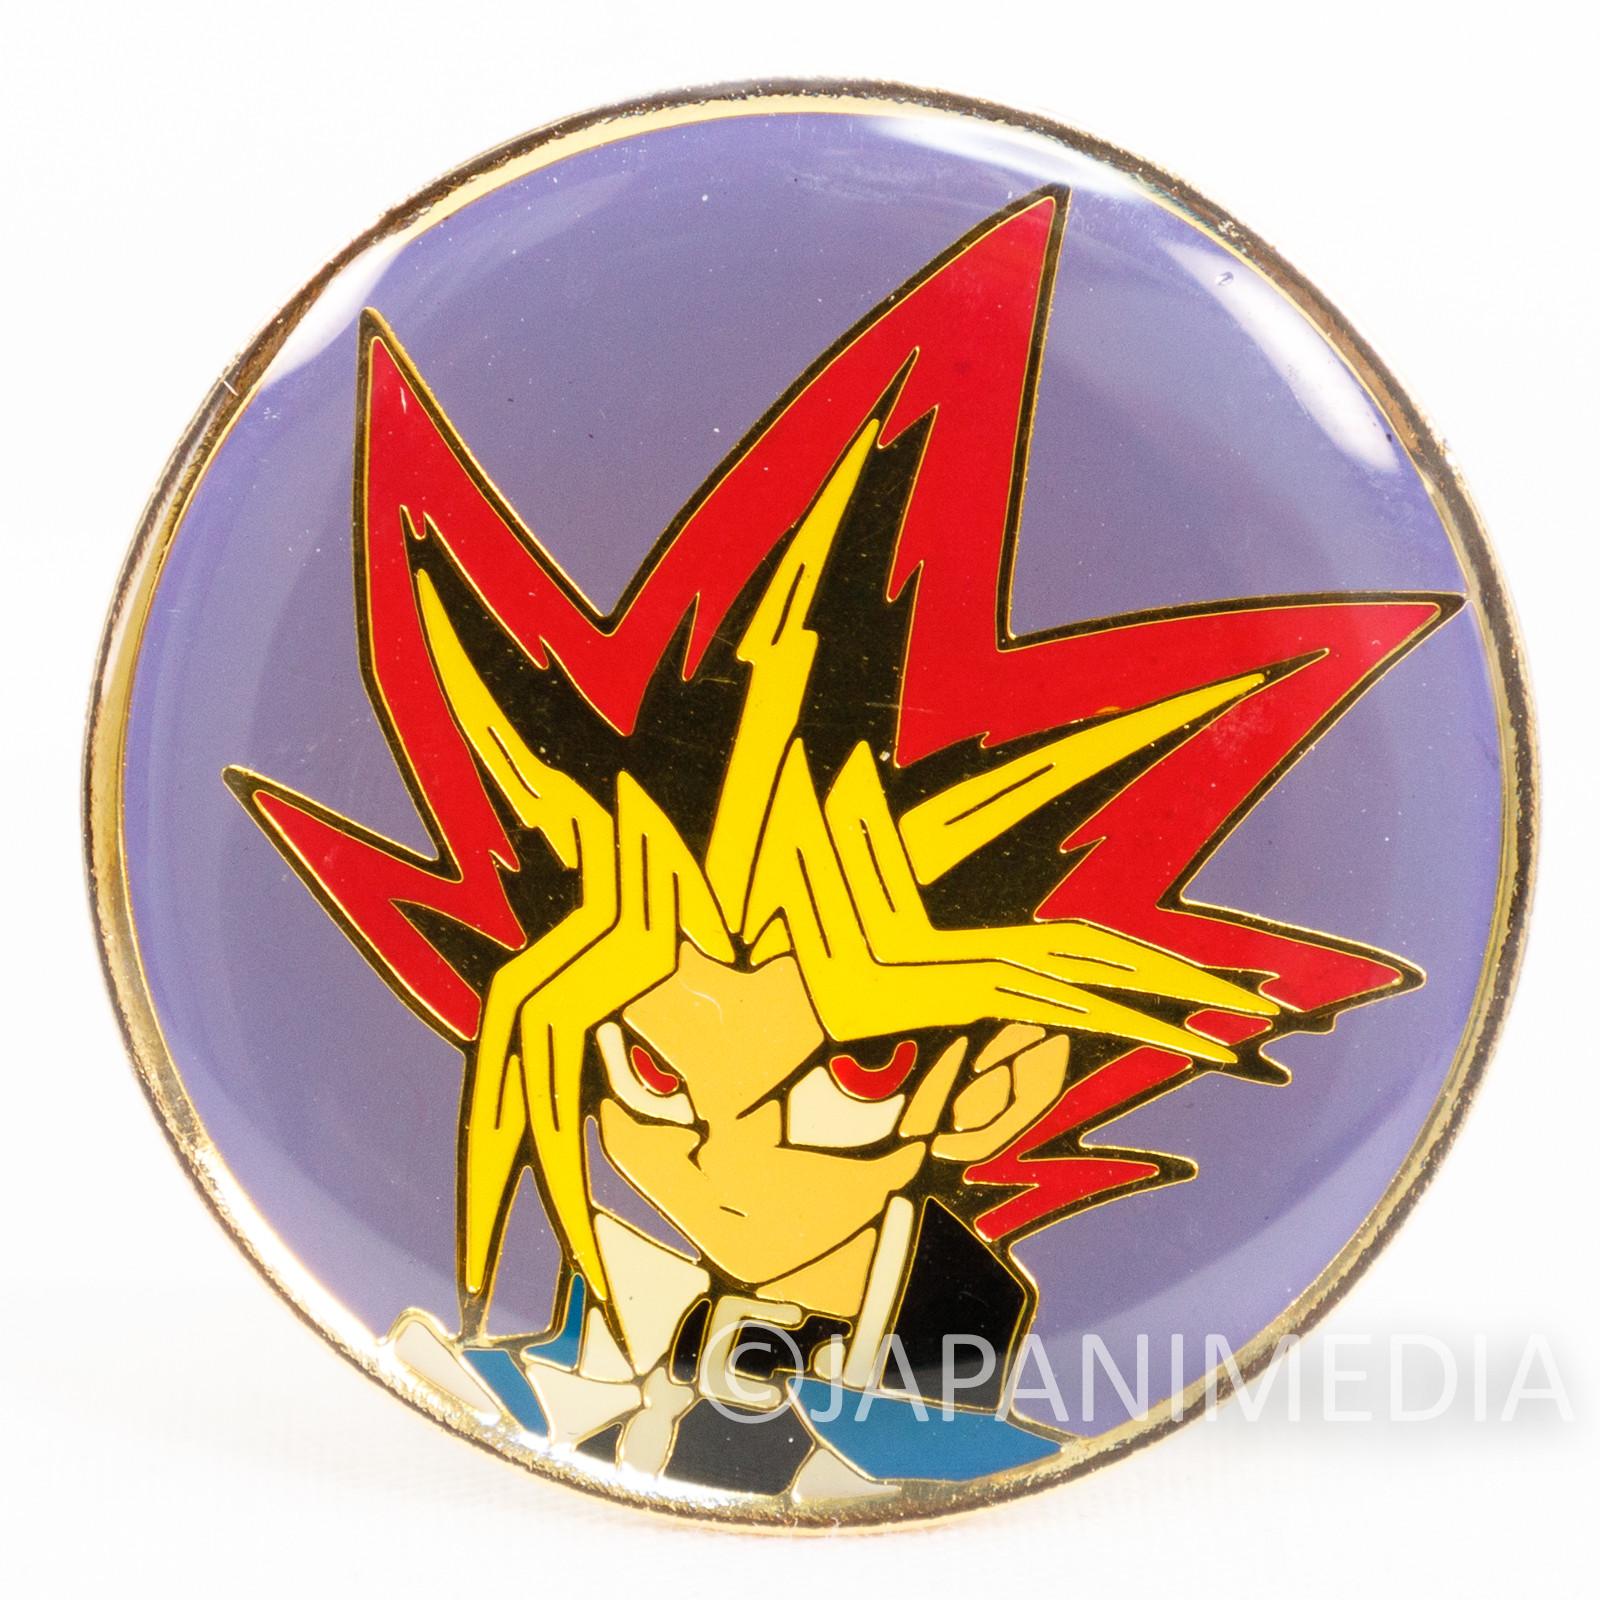 Yu-Gi-Oh! Yugi Muto Metal Pins Shonen Jump JAPAN ANIME